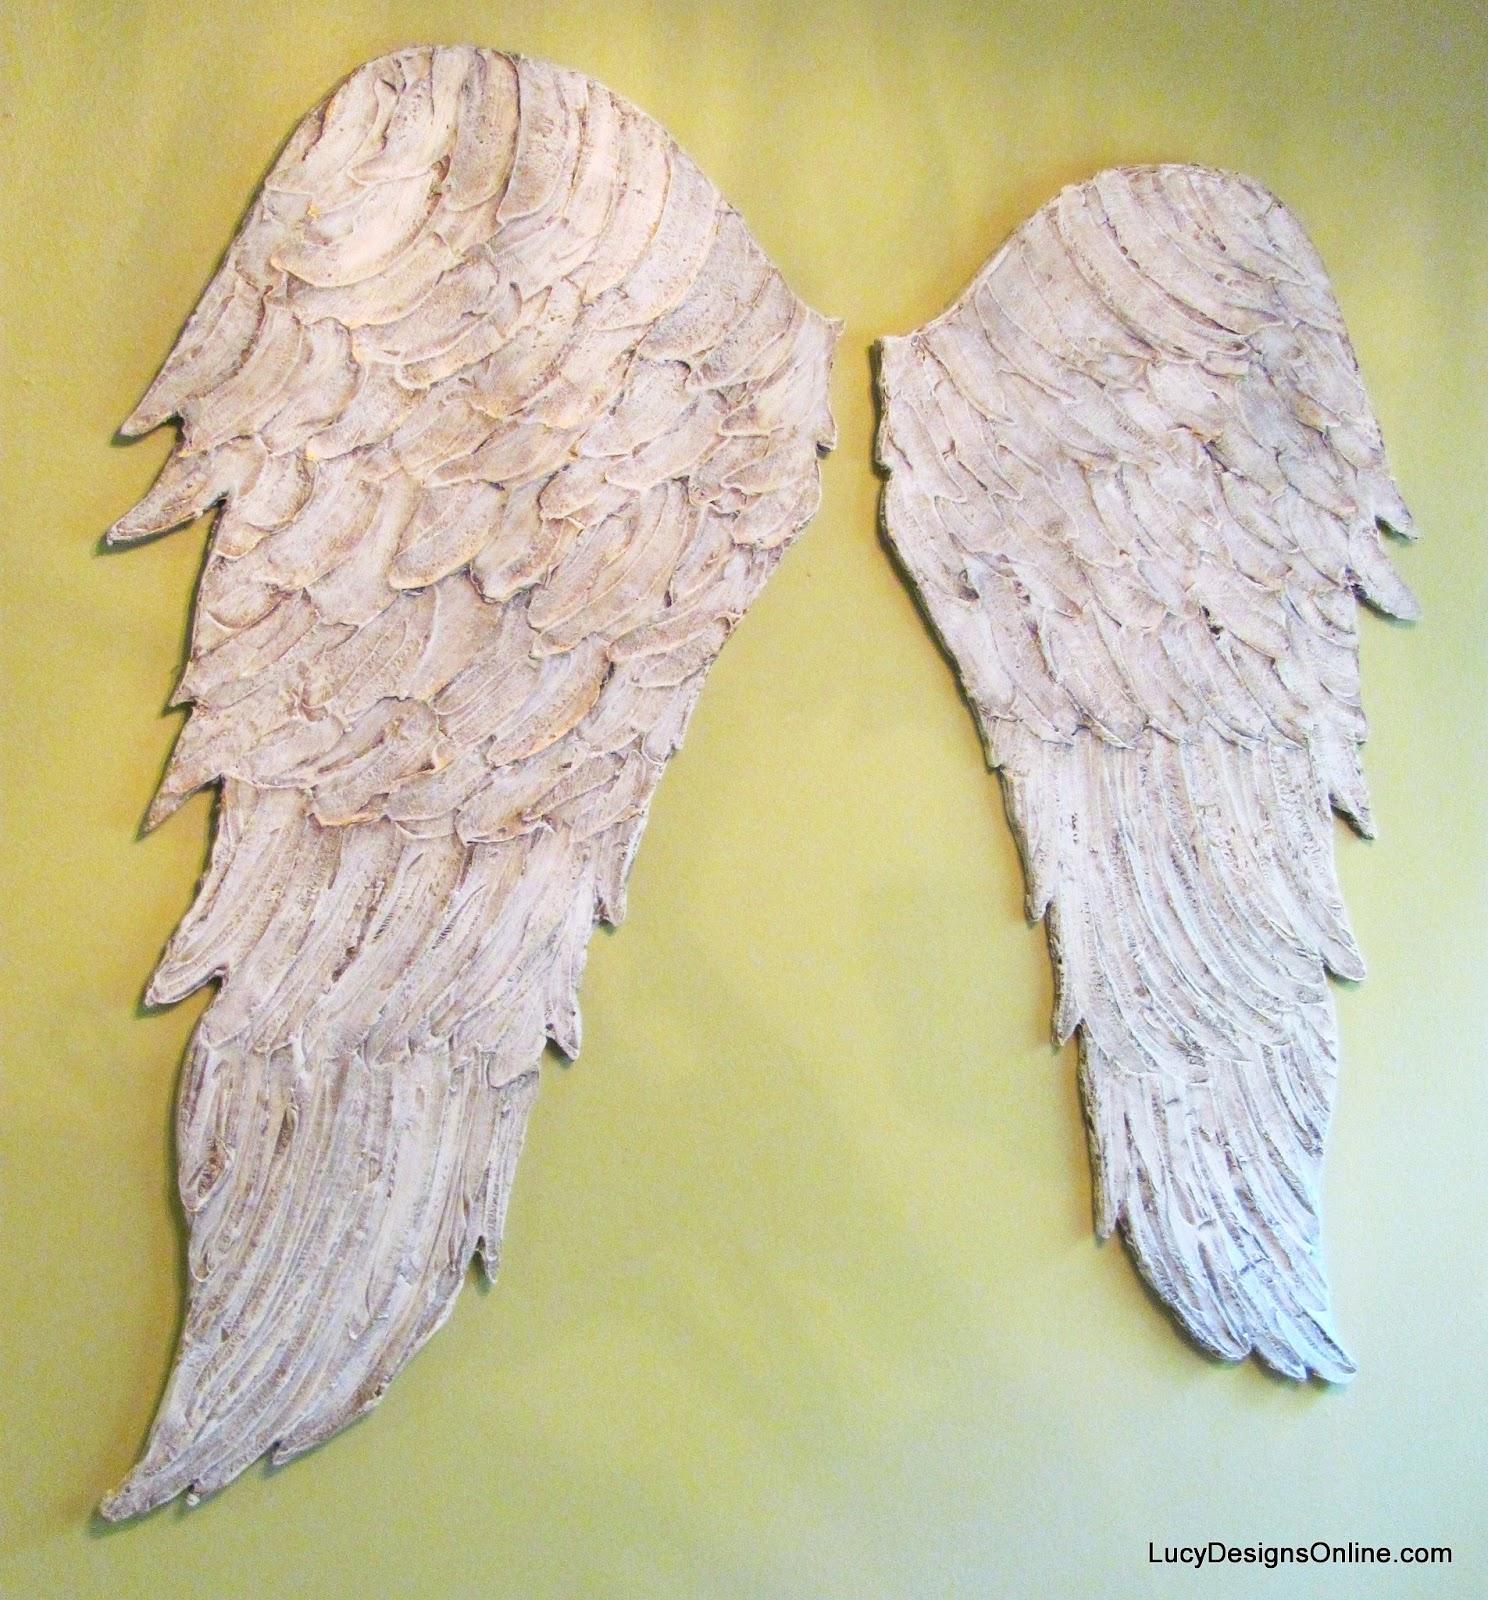 Colorful Angel Wings Wall Art Vignette - Art & Wall Decor ...